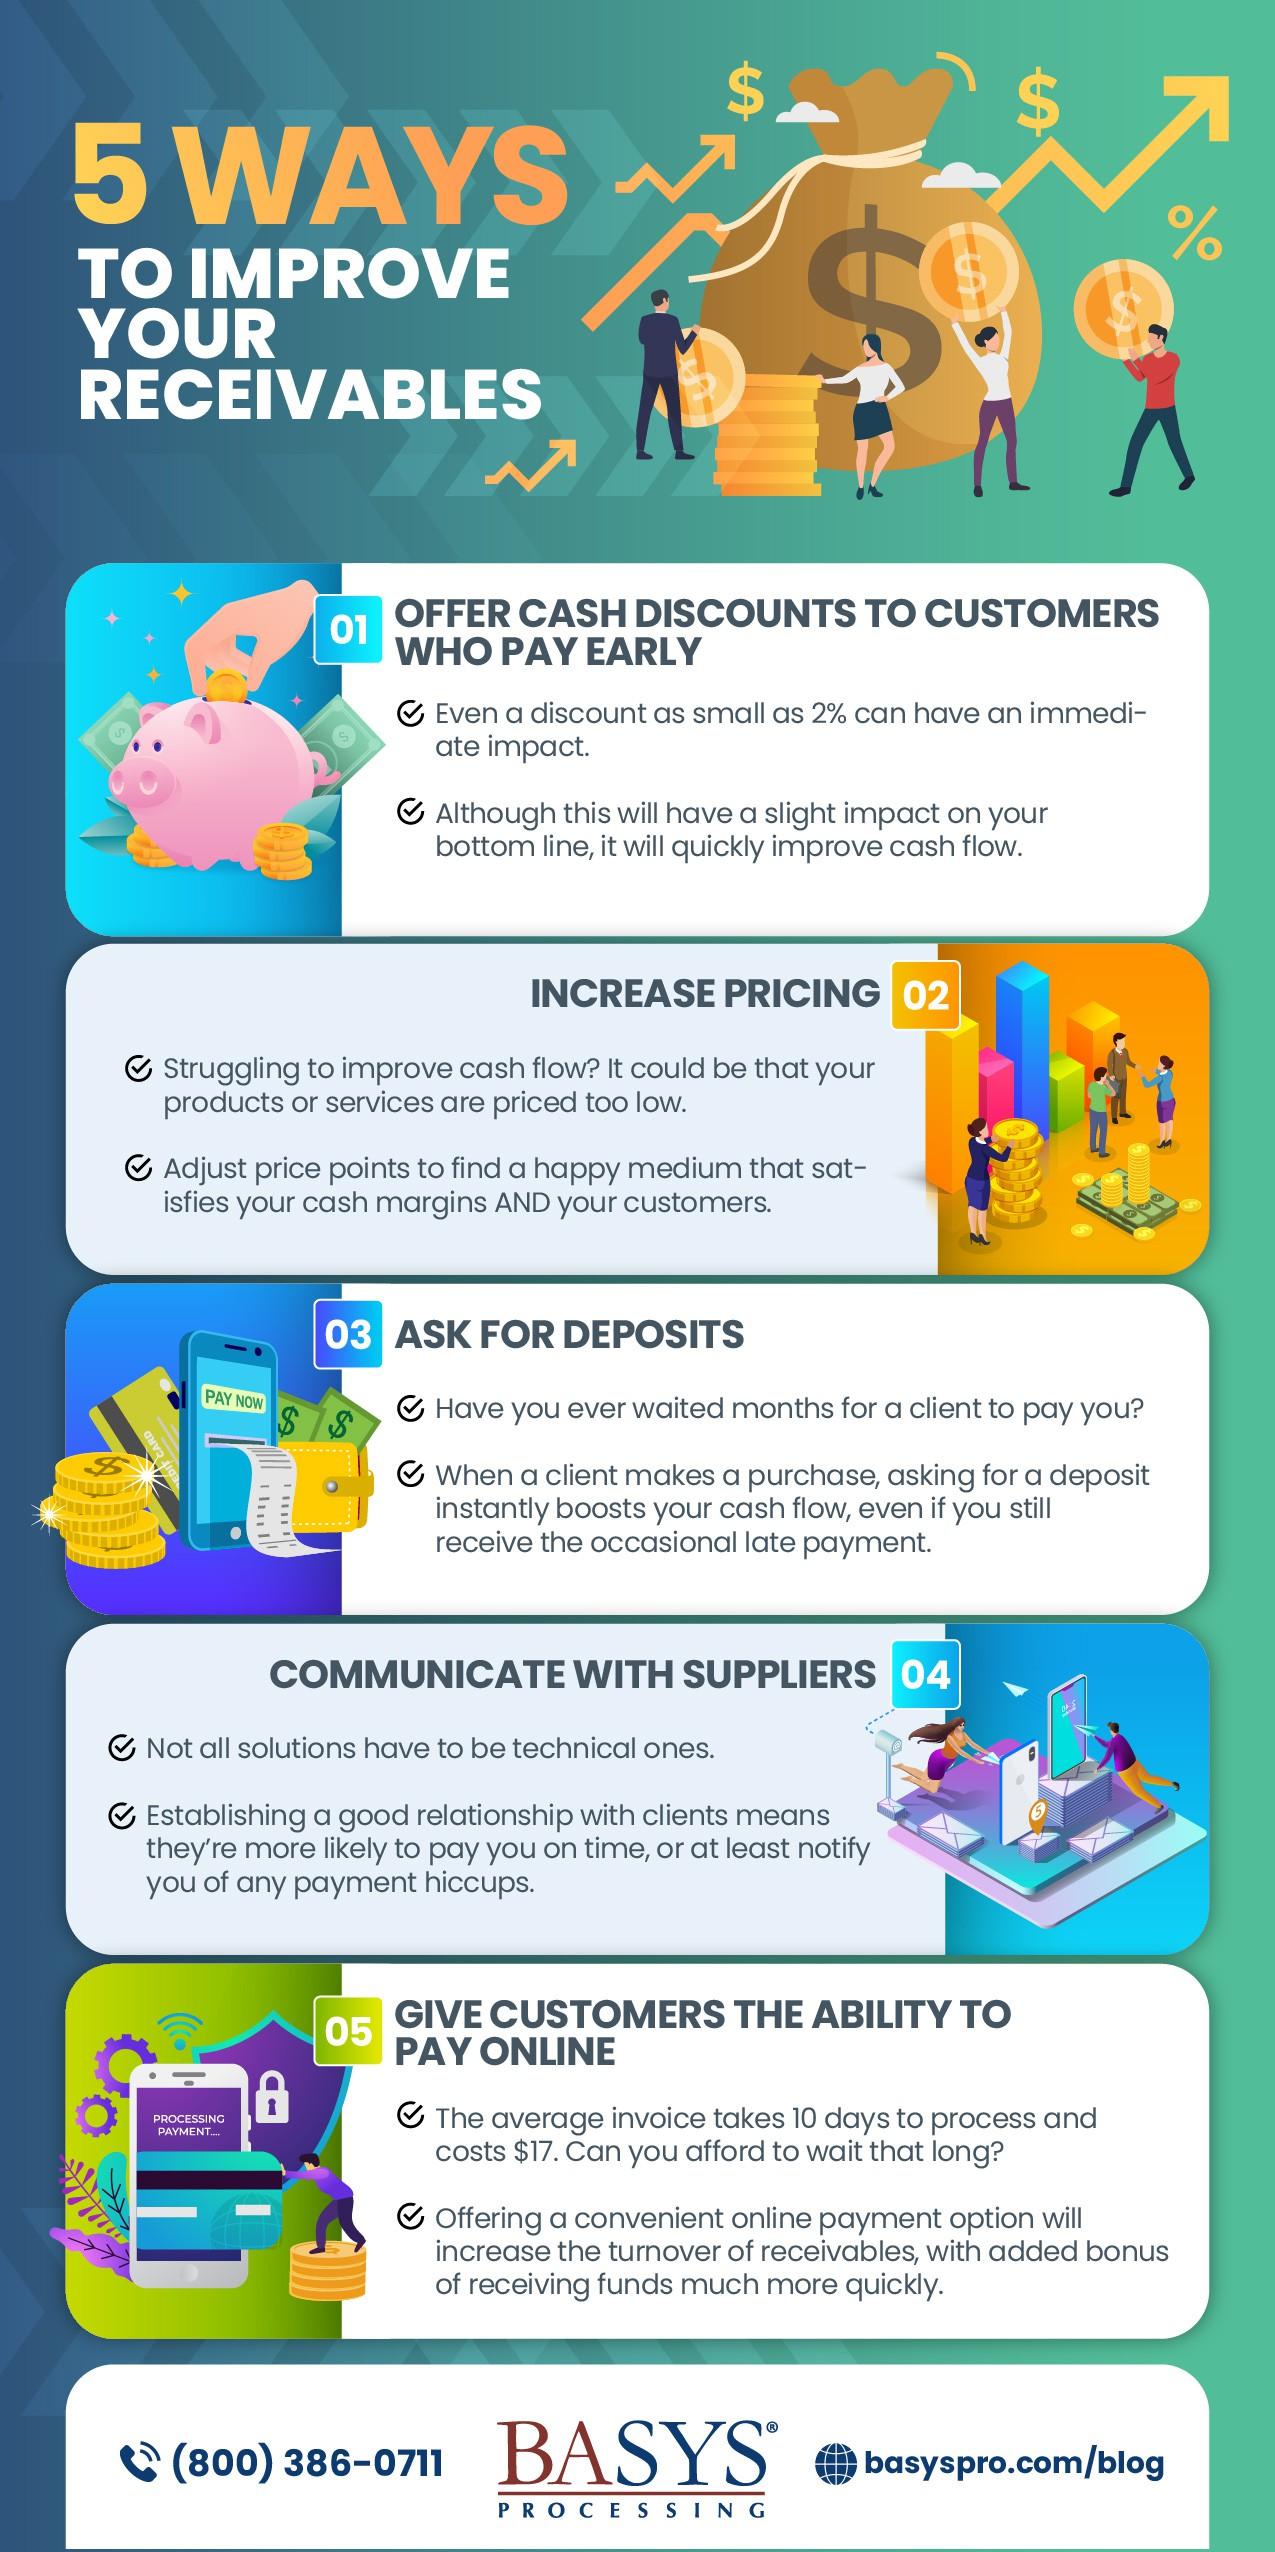 5 Ways to Improve Your Receivables